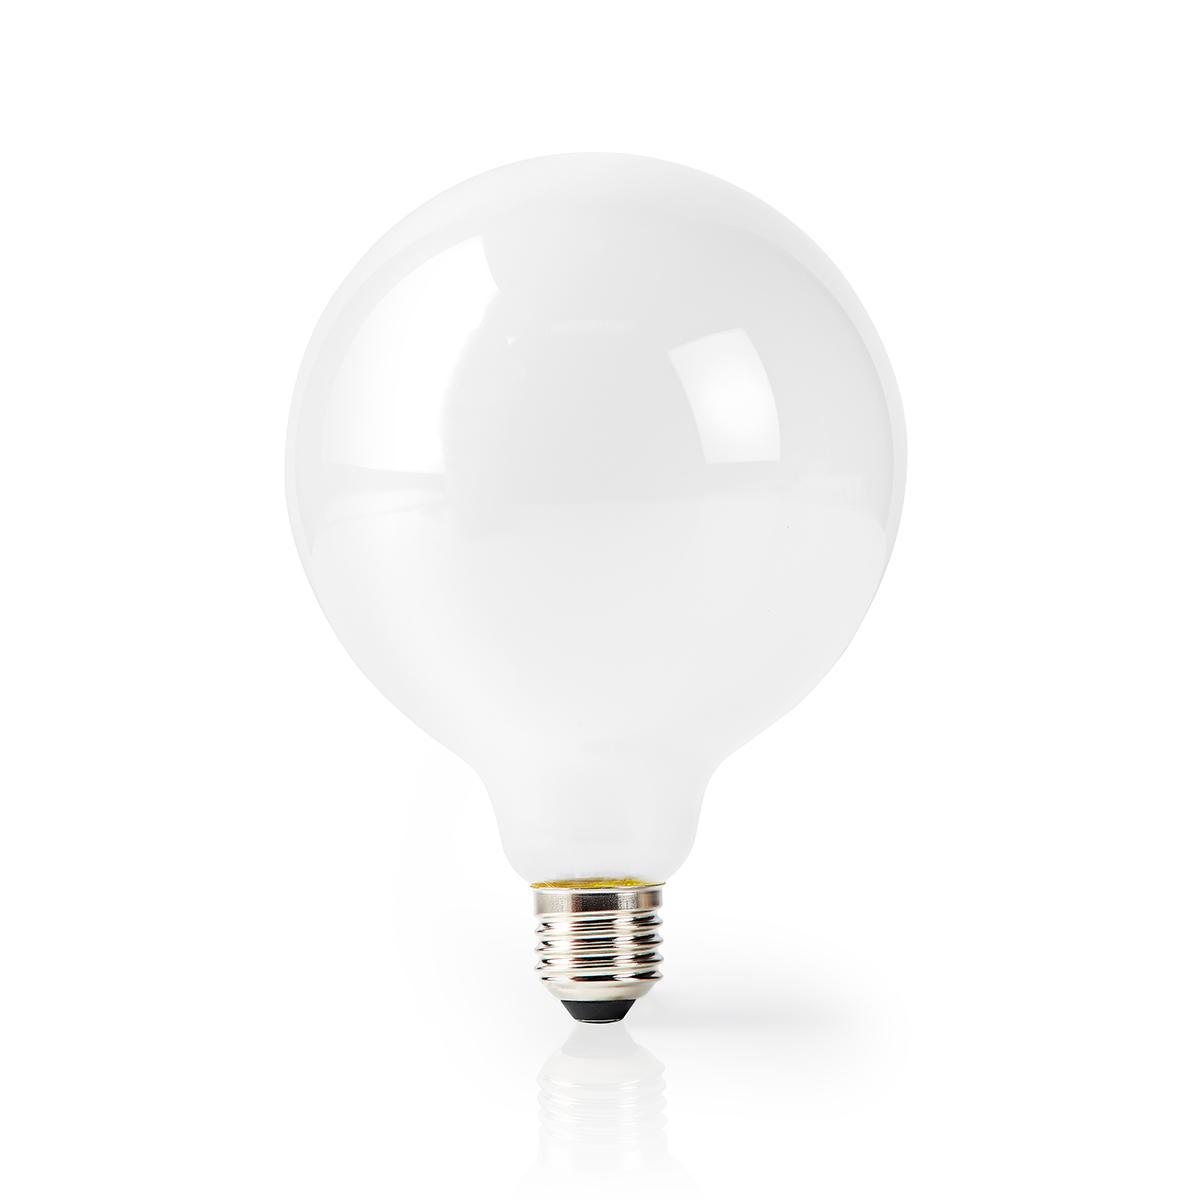 Smart lamp globe Led Lamp 5 Watt 2700K - Warm wit - lamp uit